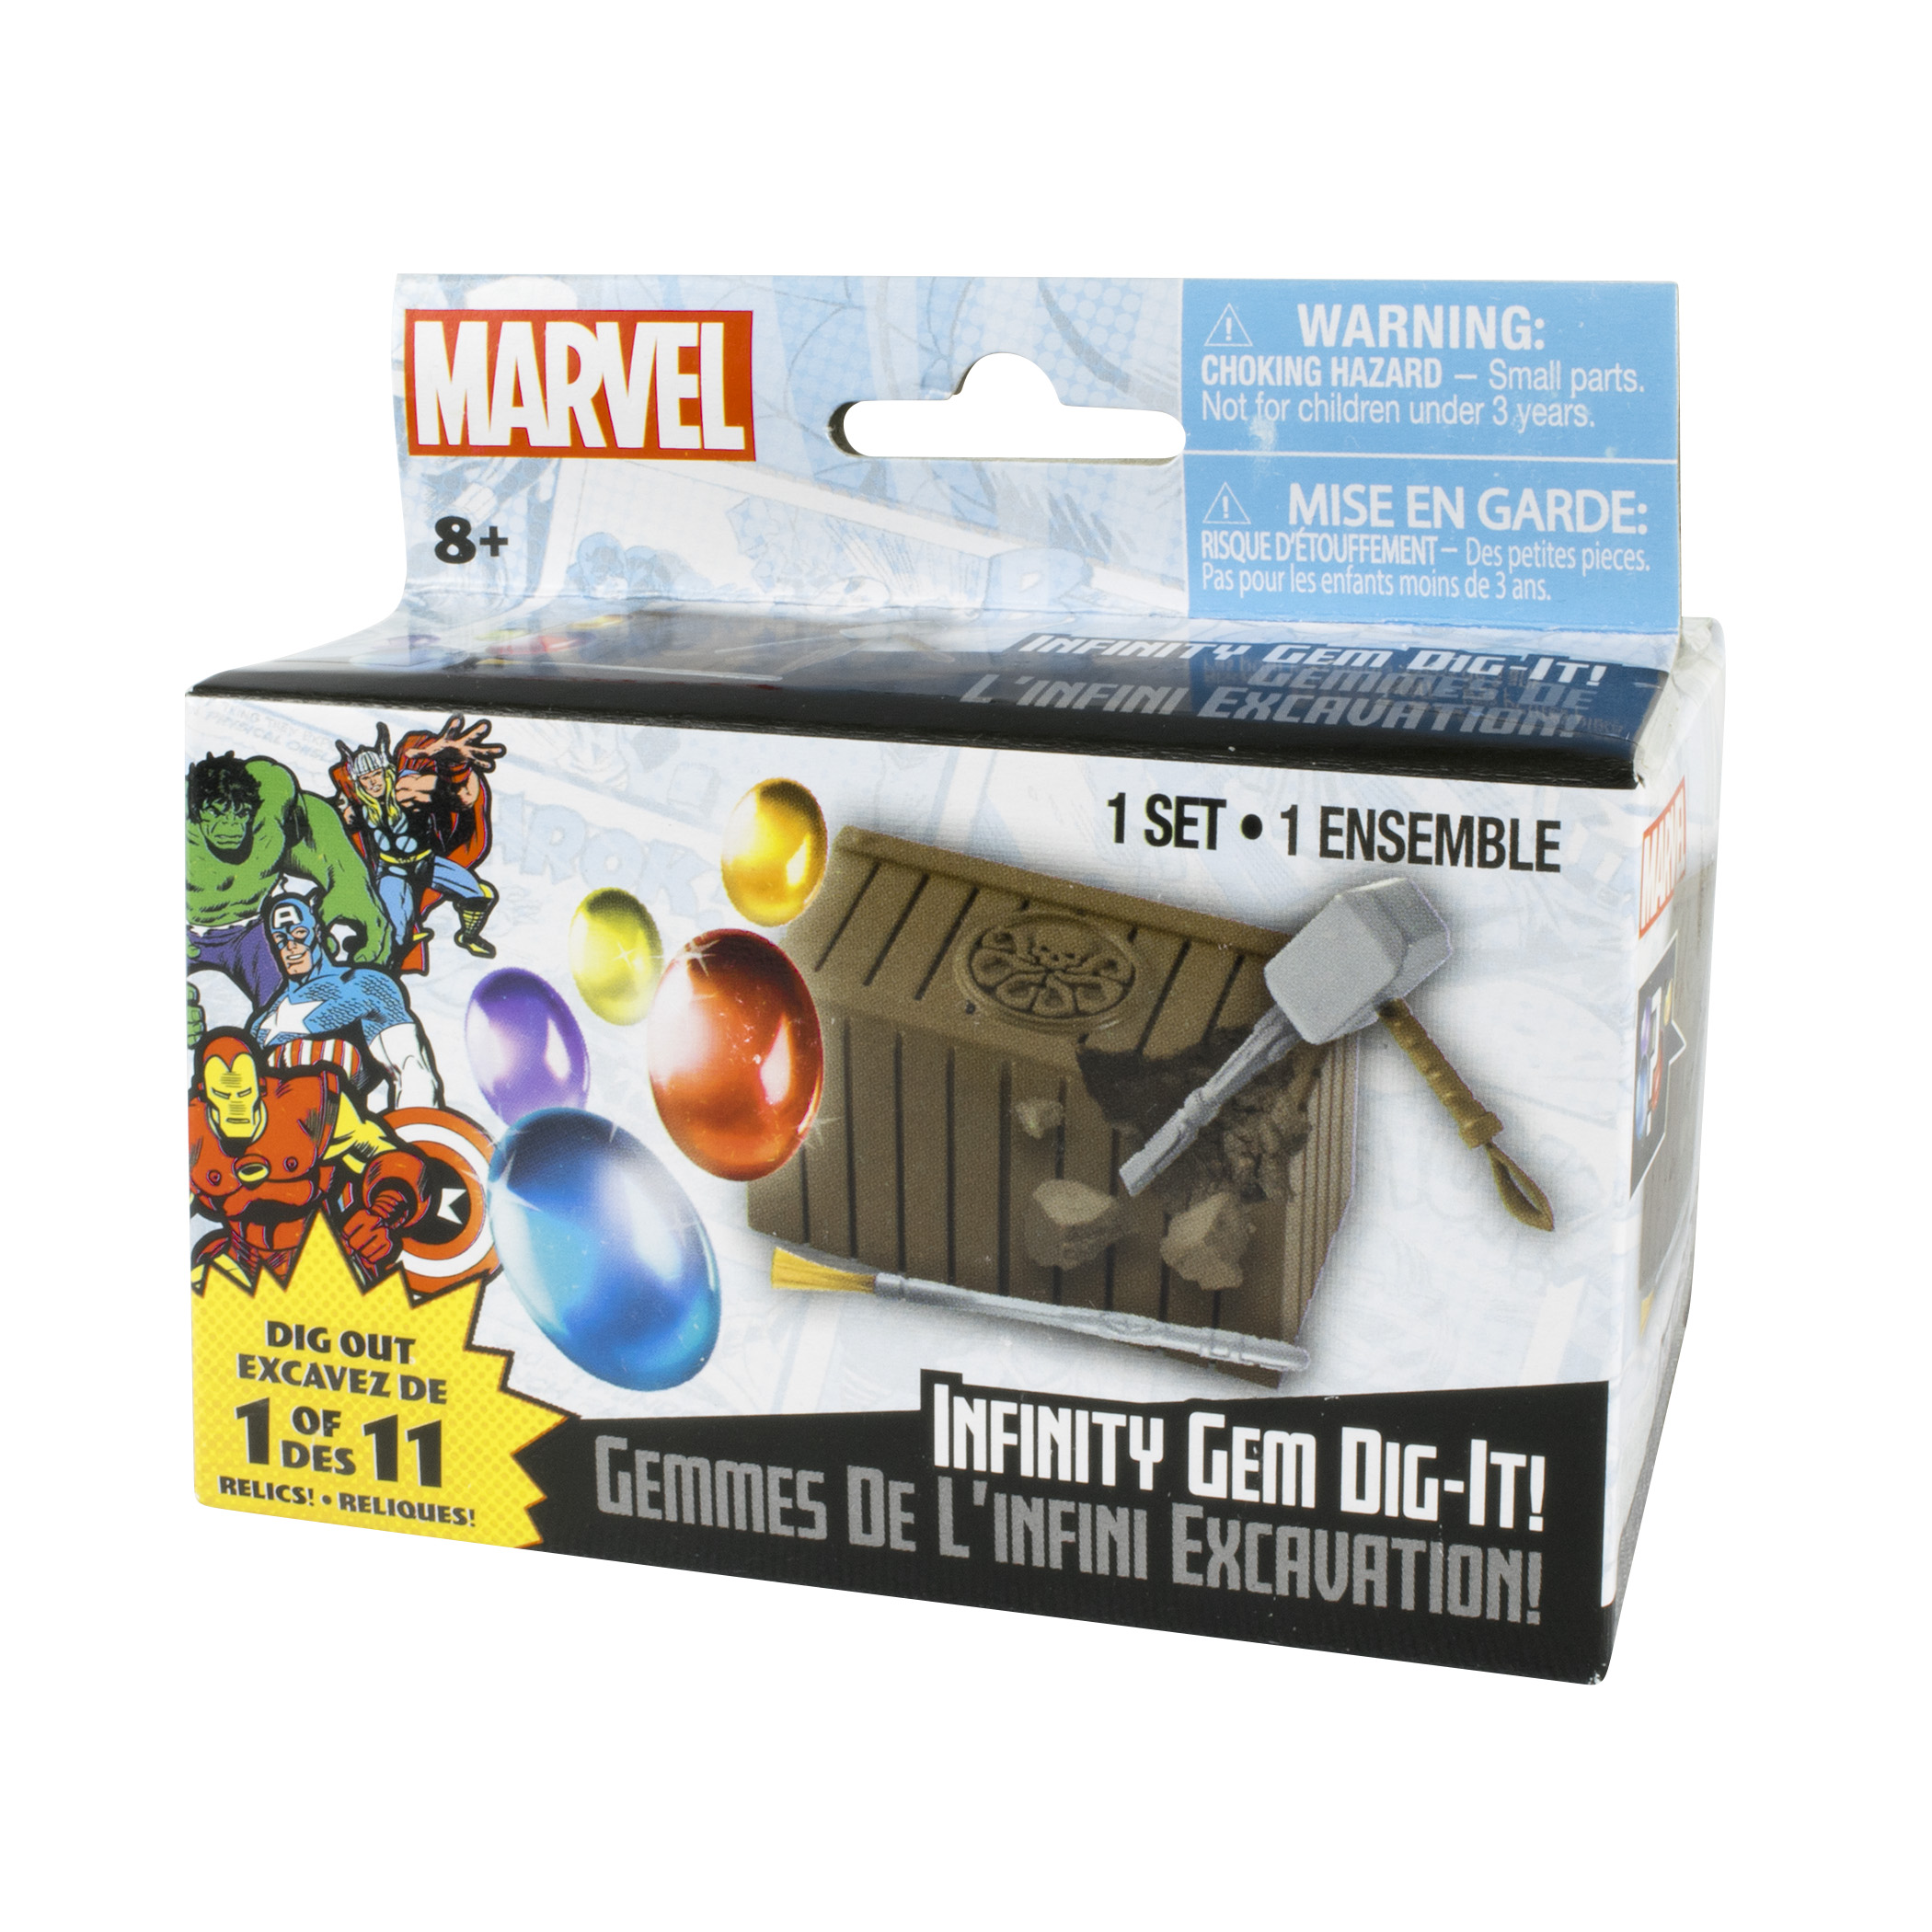 Marvel Infinity Gem Dig It Grin Studios